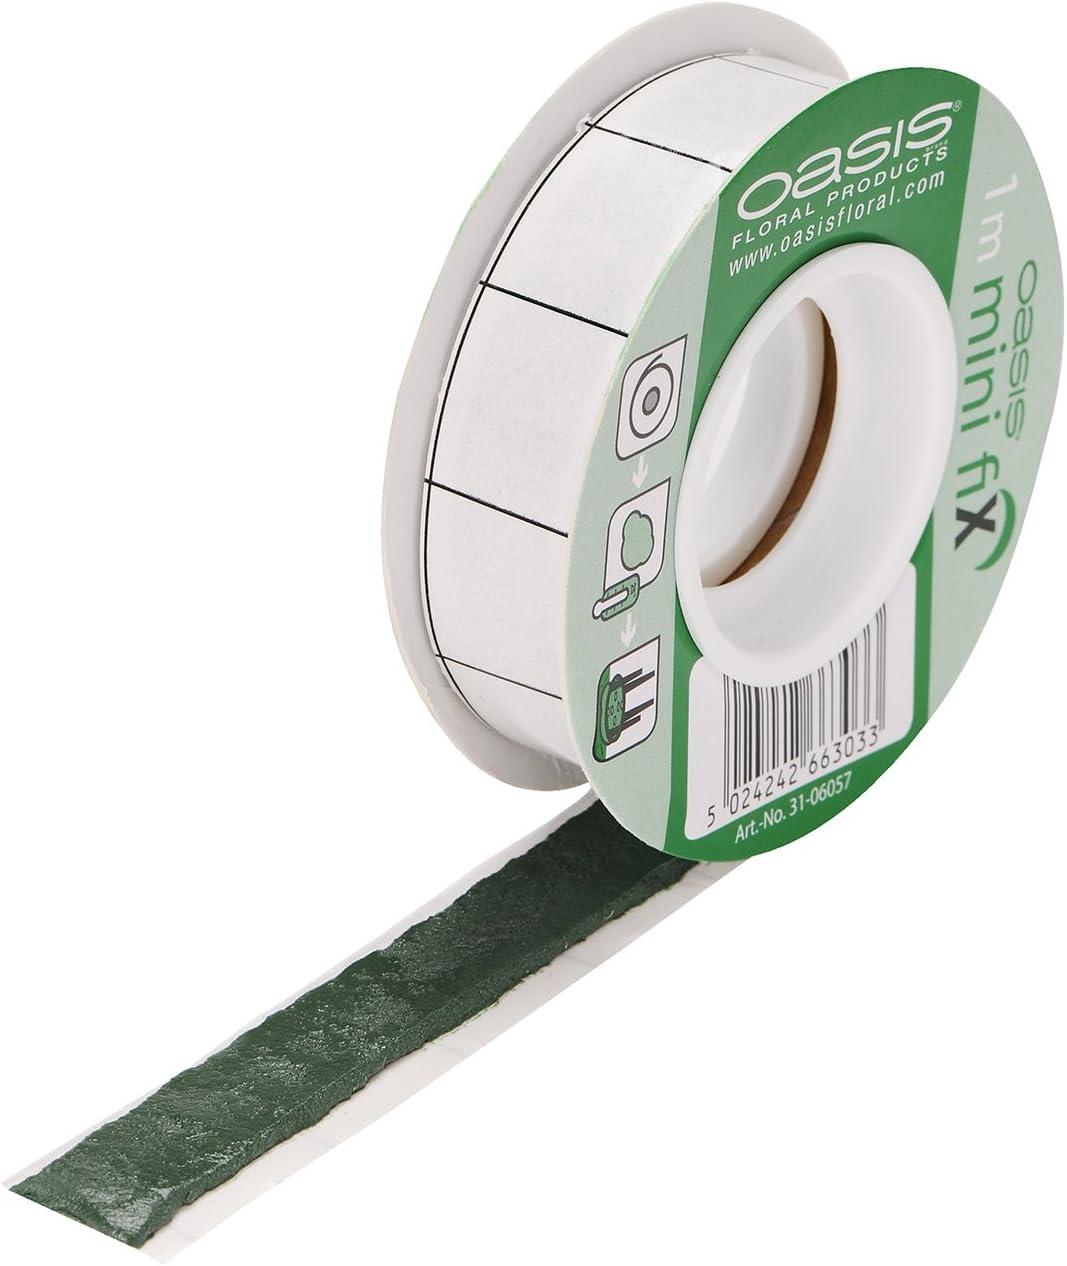 Oasis Mini Fix Adhesive Sticky Tack Tape Waterproof Floral Florist 1 Metre Roll